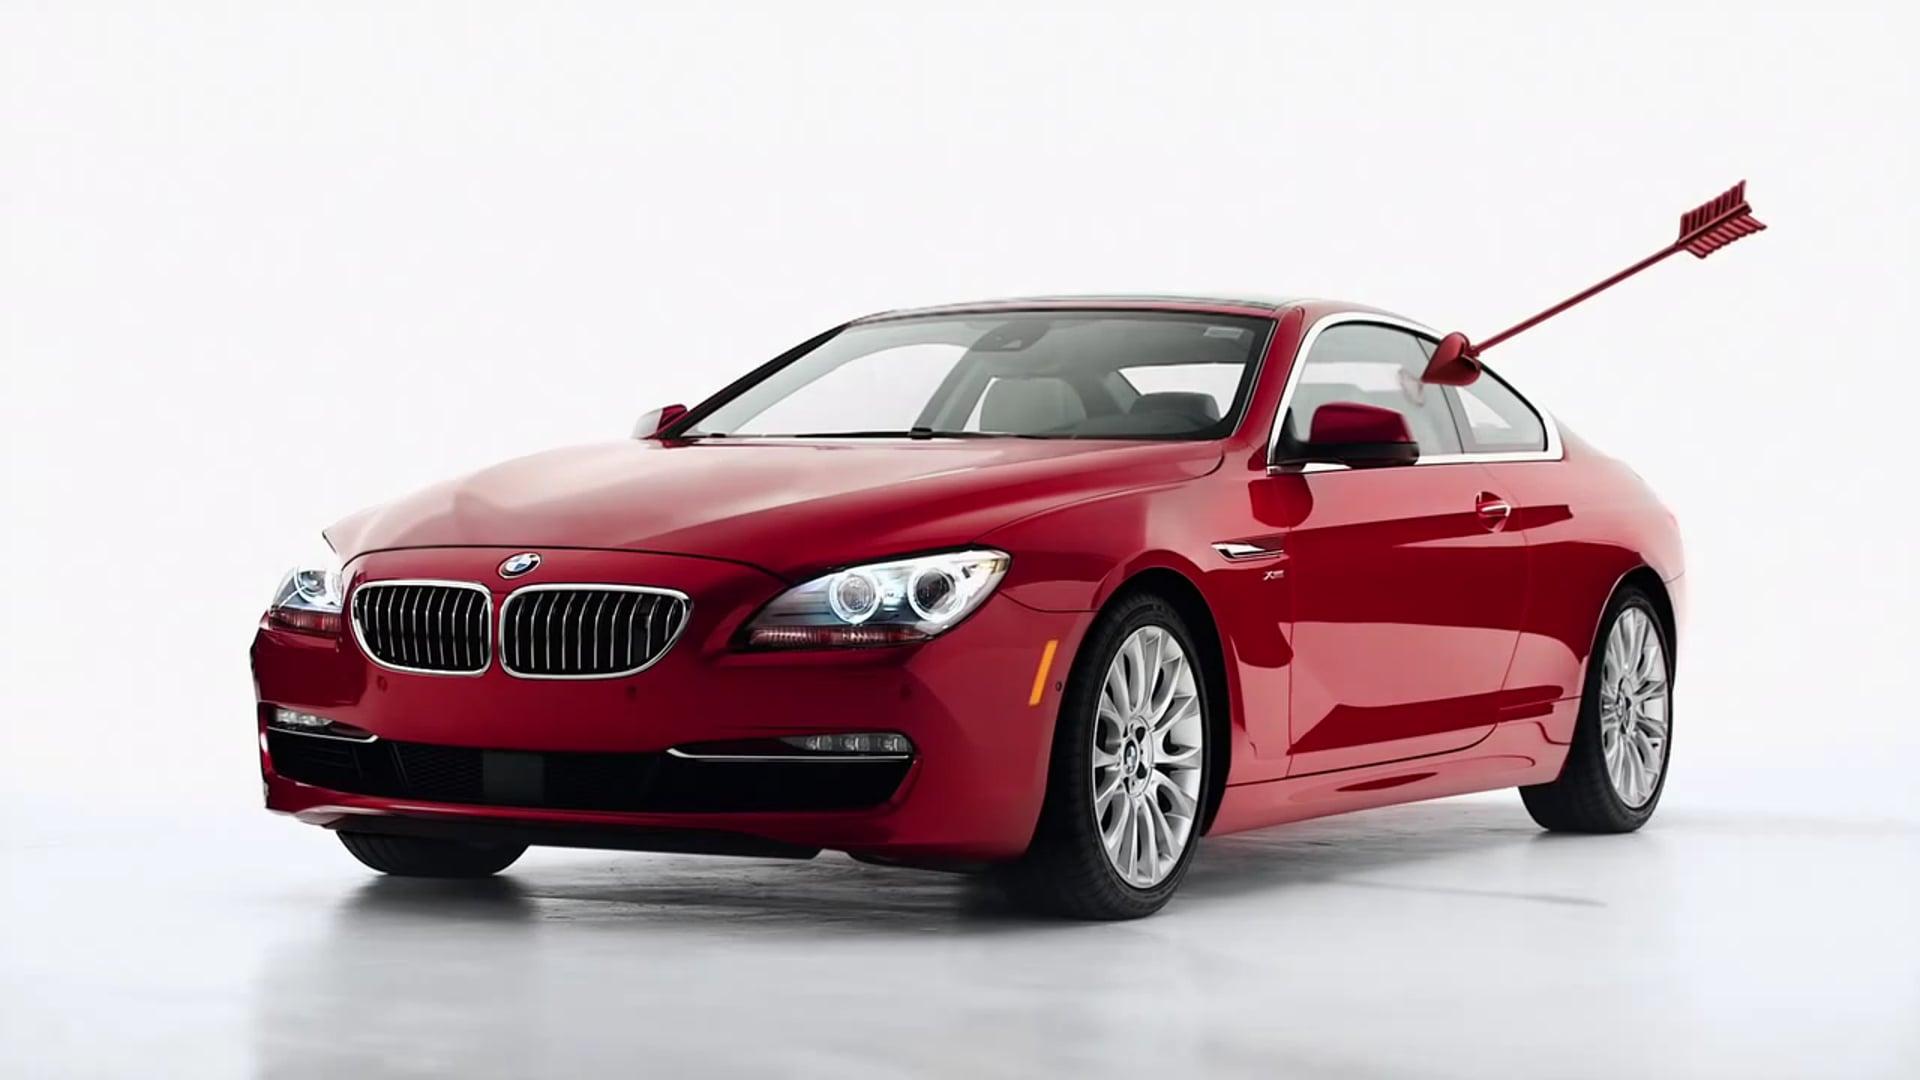 BMW - Cupid Valentines Day